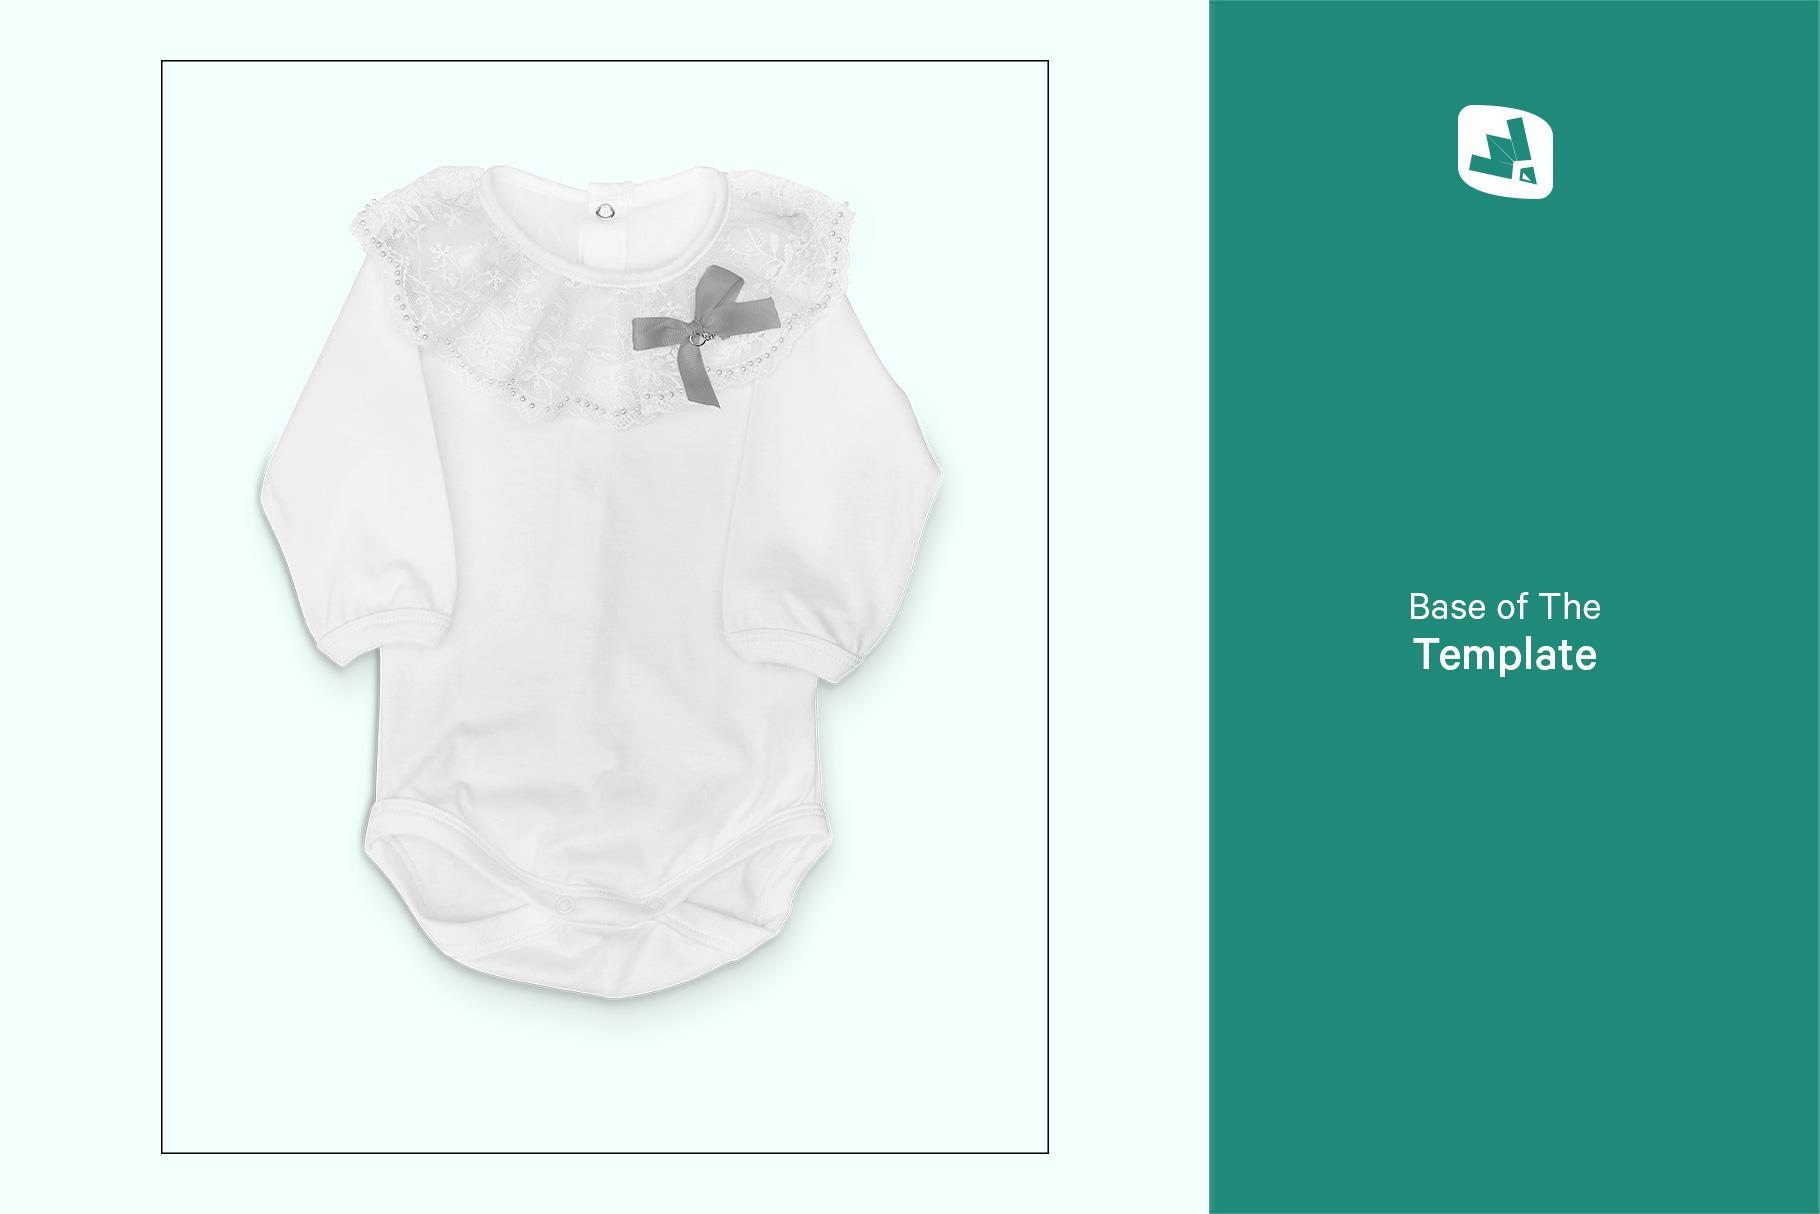 base image of the baby girl's onesie mockup